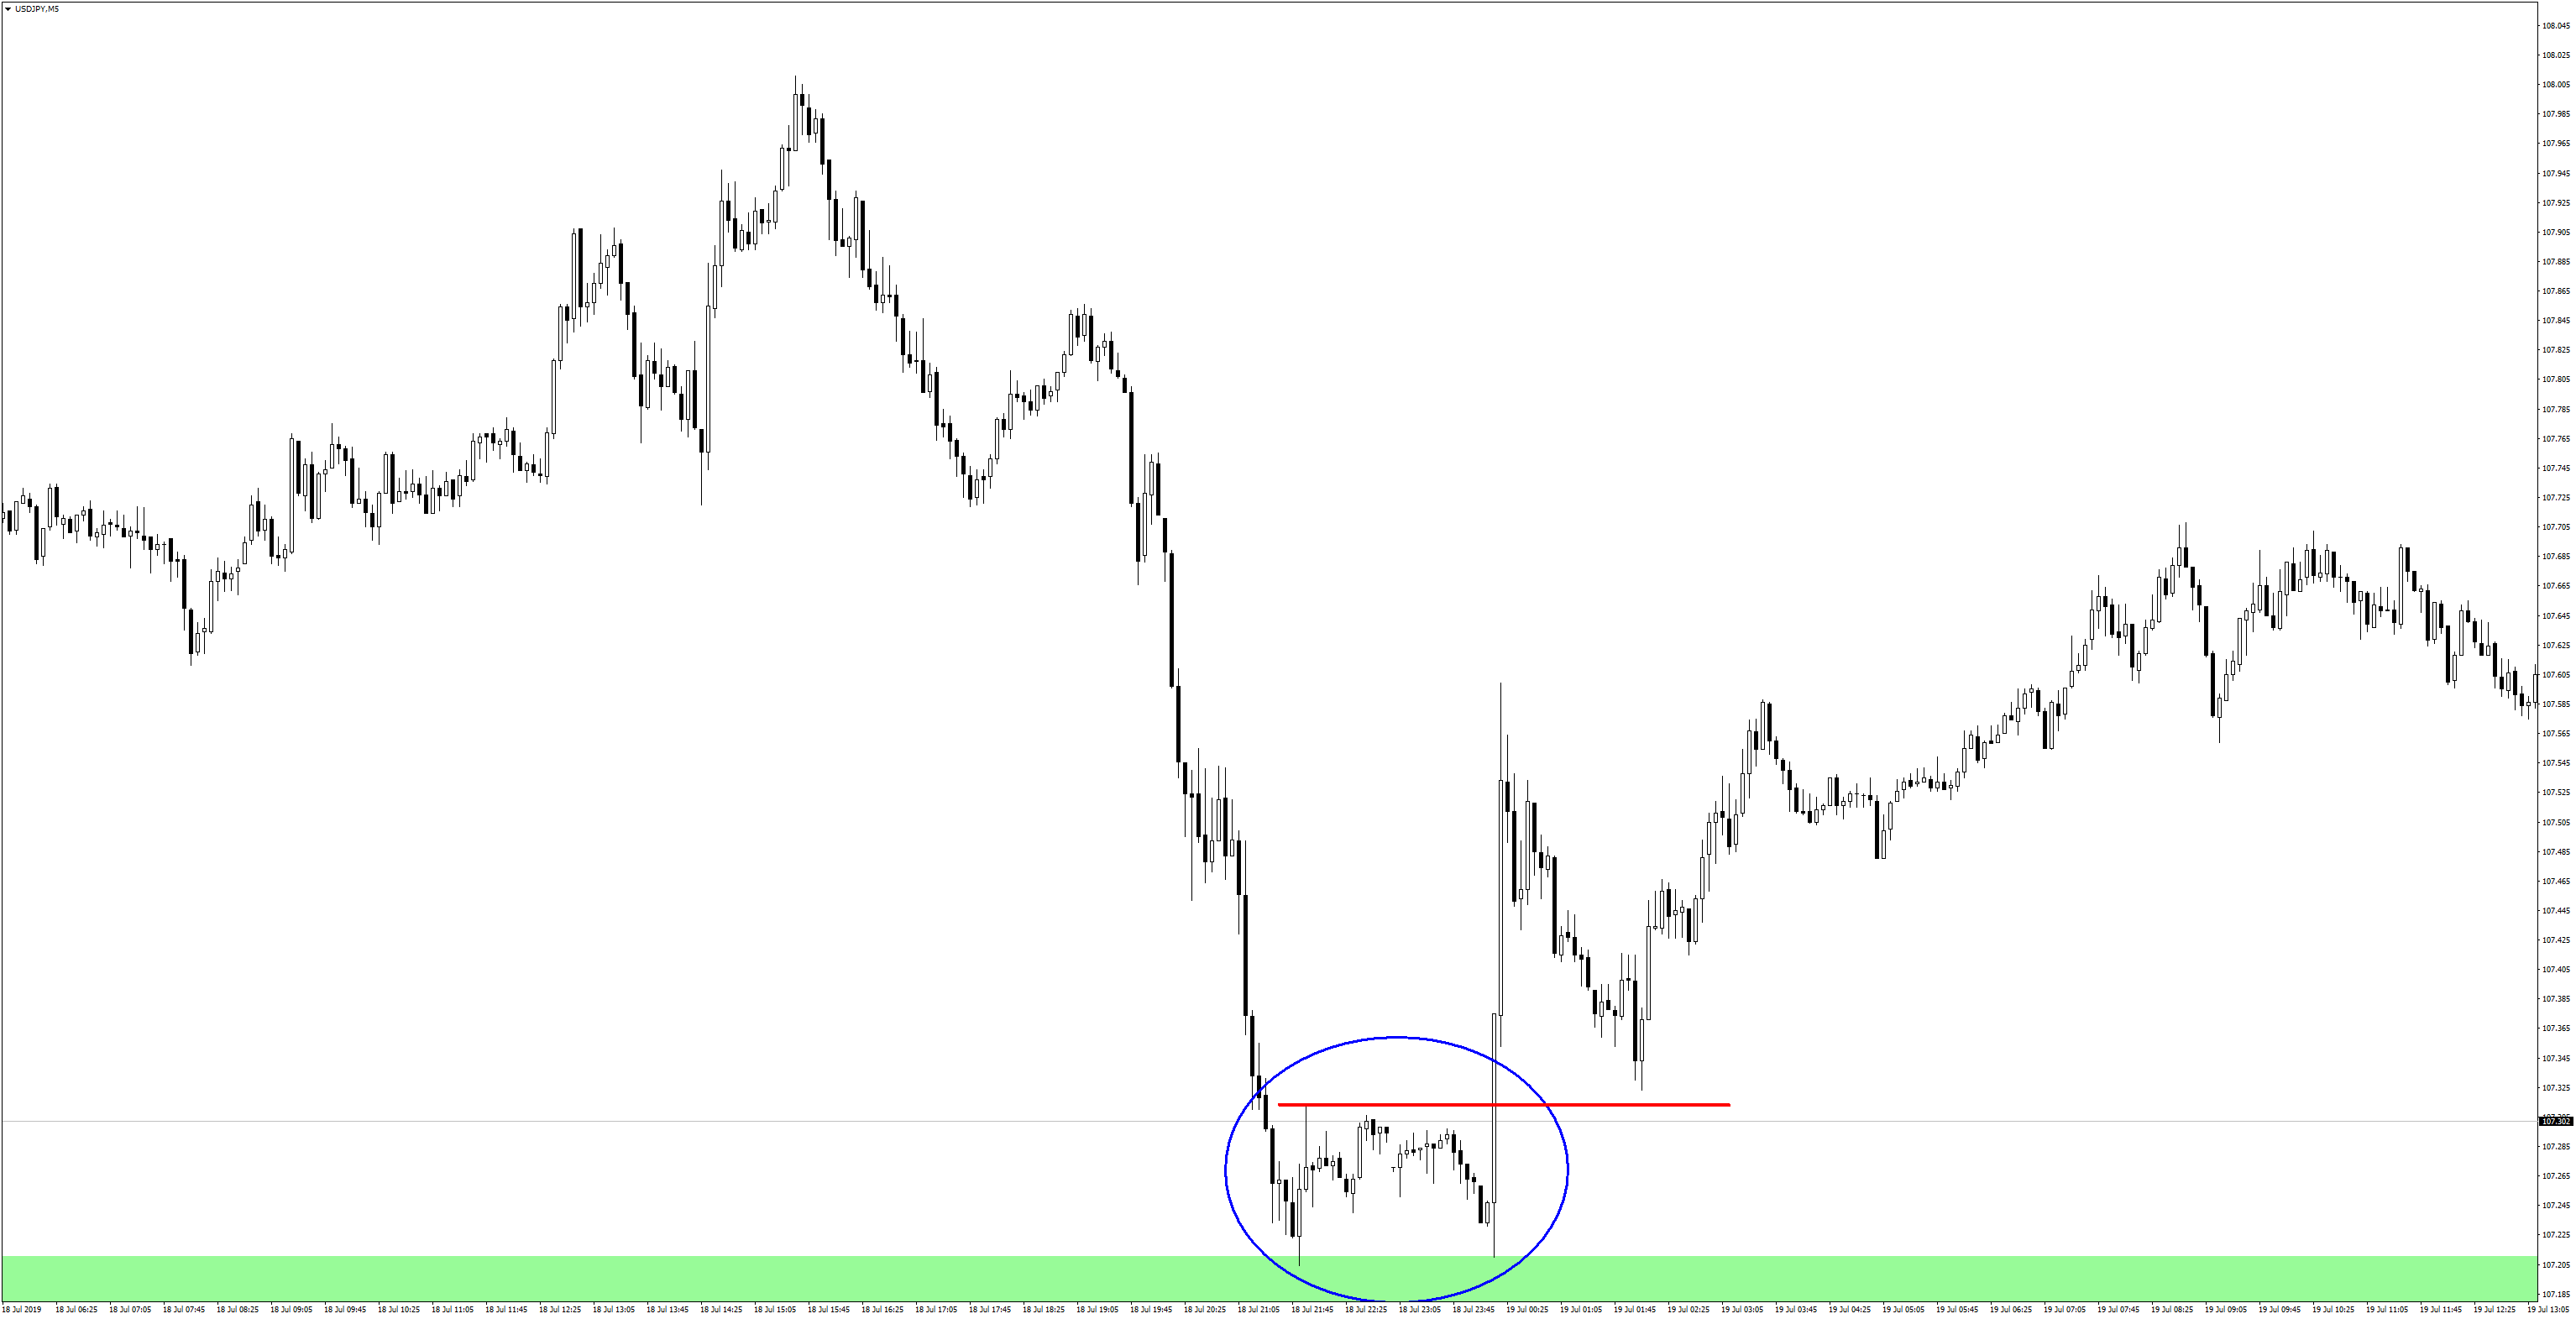 USDJPYM5-price reversal in the demand zone